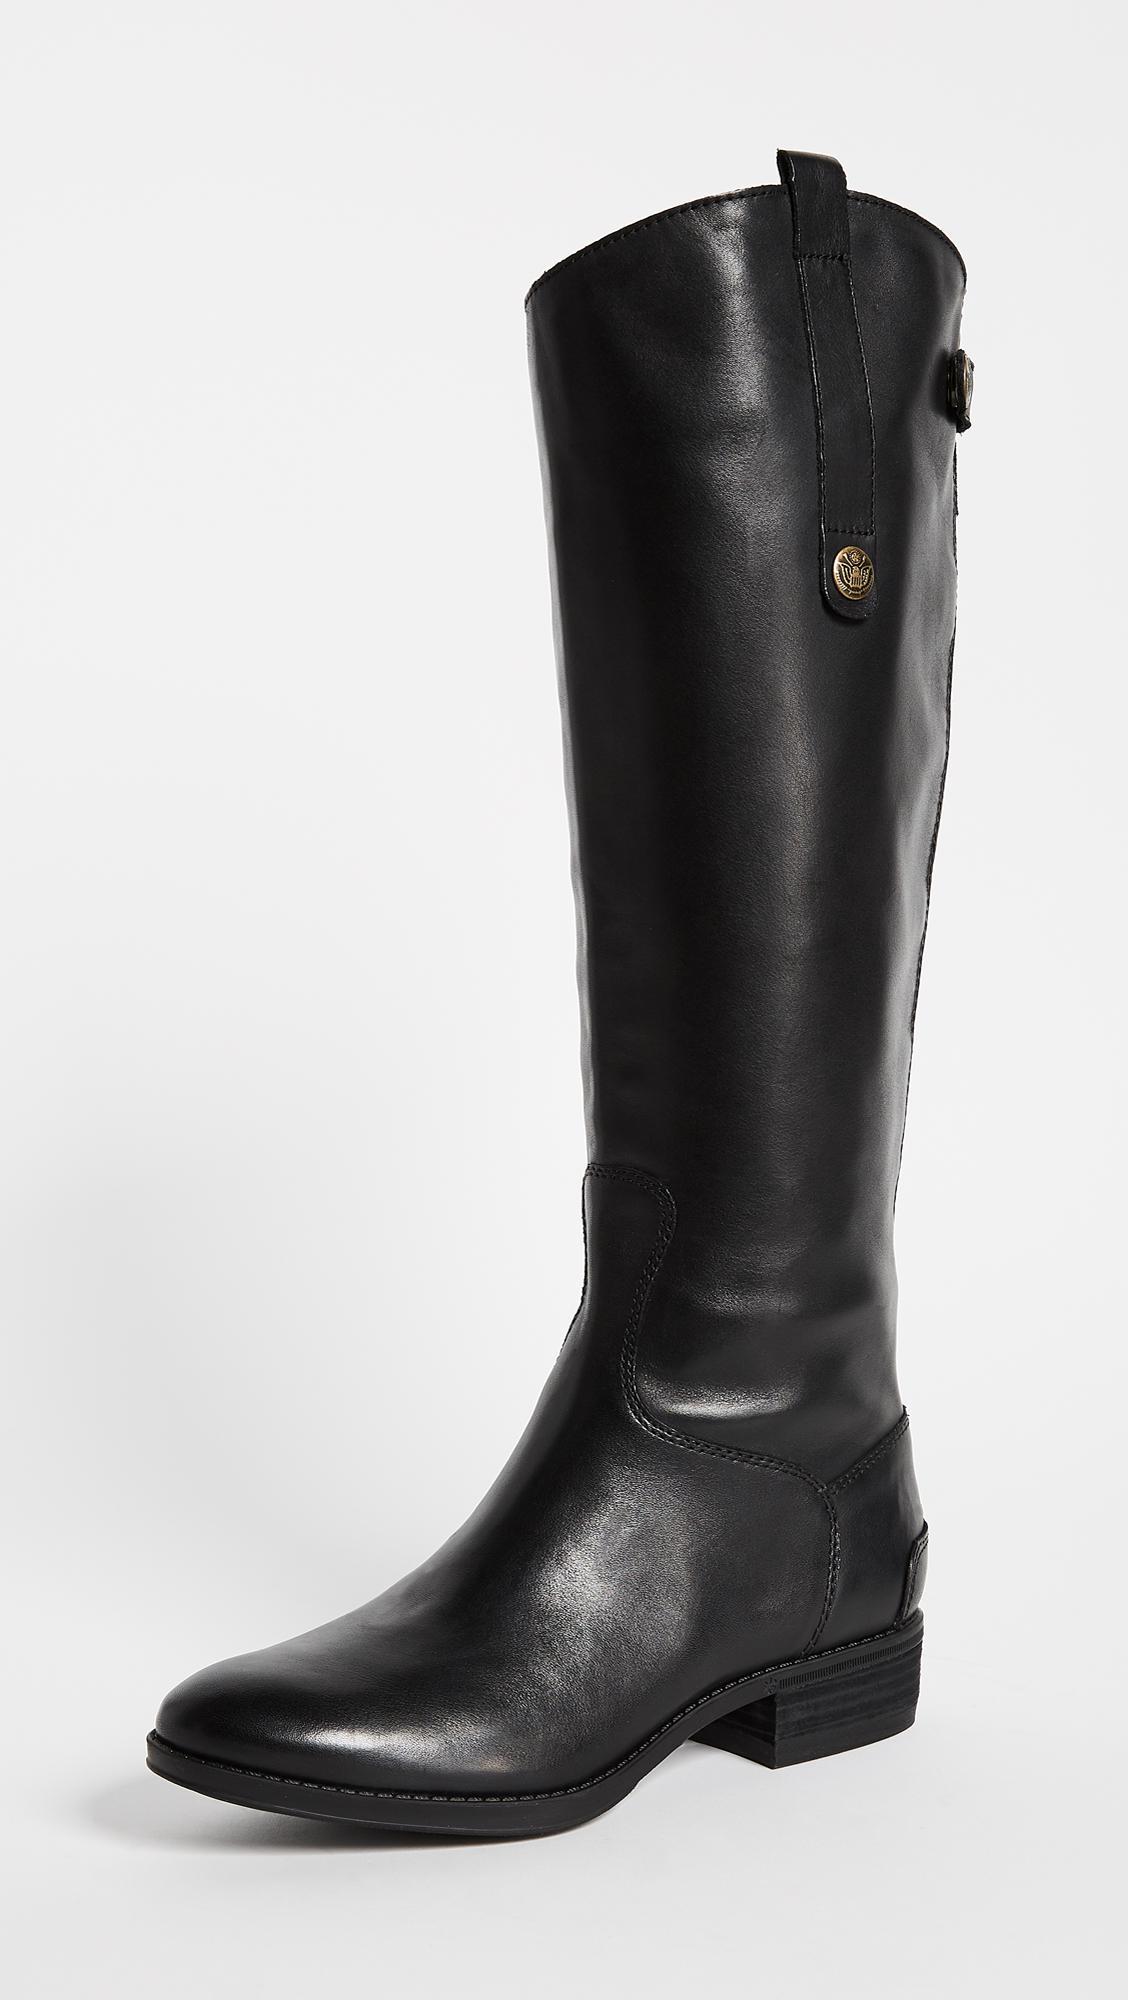 f32b4ebd908b Lyst - Sam Edelman Penny Riding Boots in Black - Save 1%